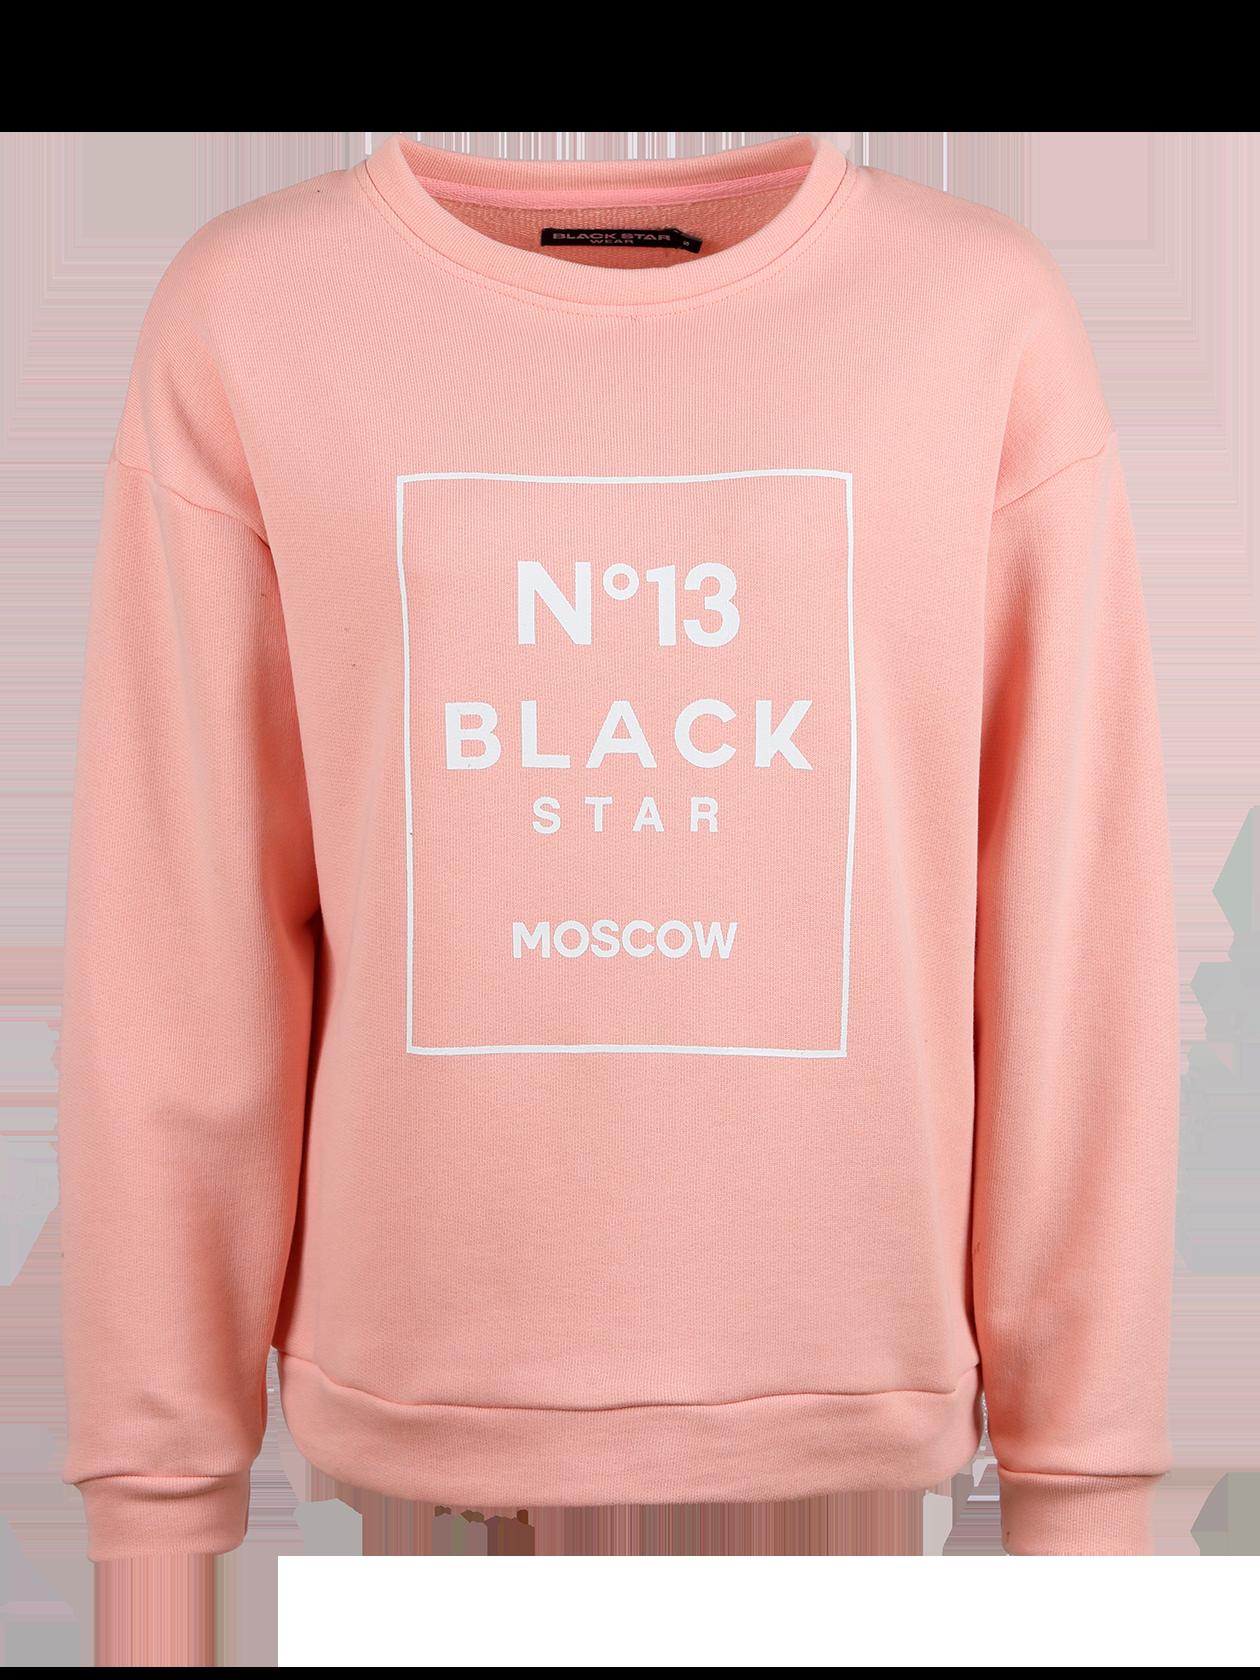 Толстовка женская №13 Black Star от Black Star Wear